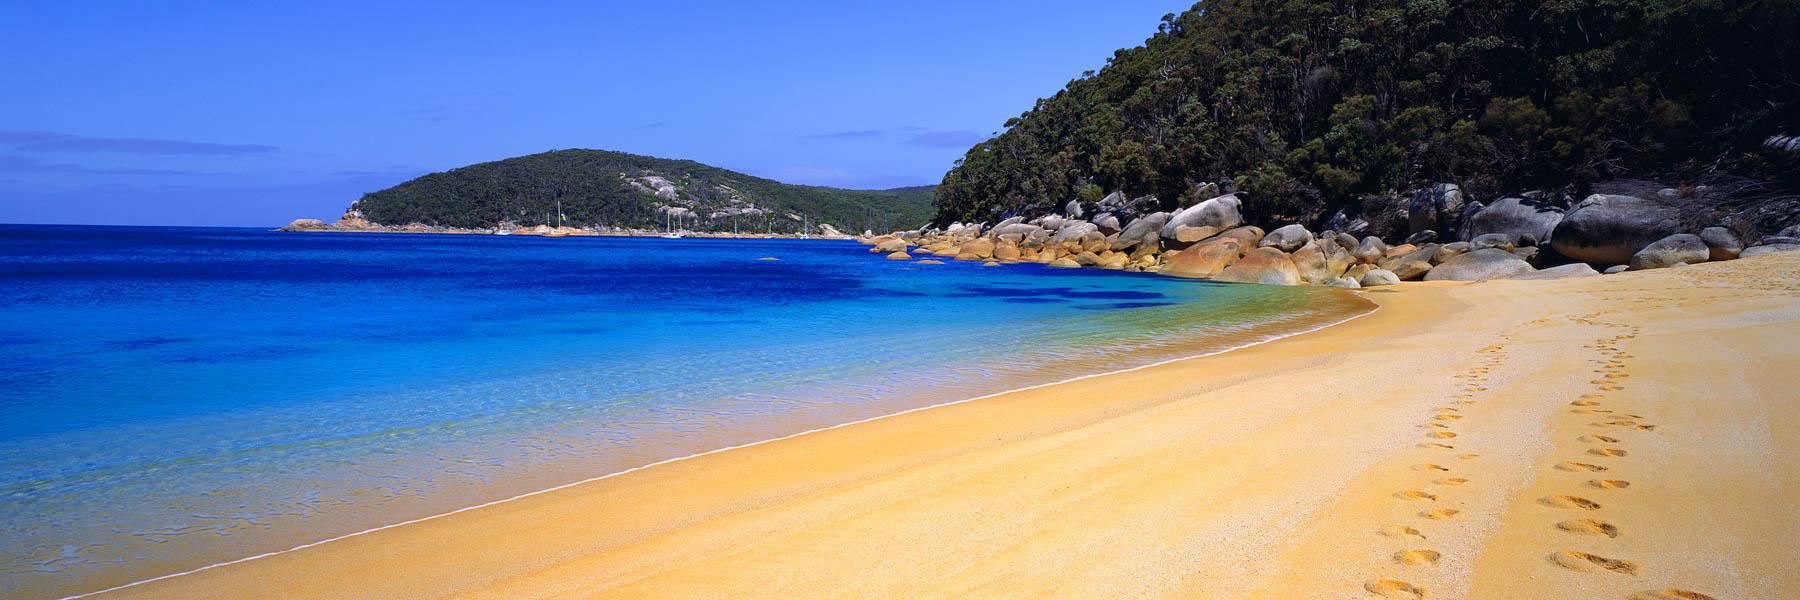 Refuge Cove, Wilsons Promontory, Victoria, Australia.